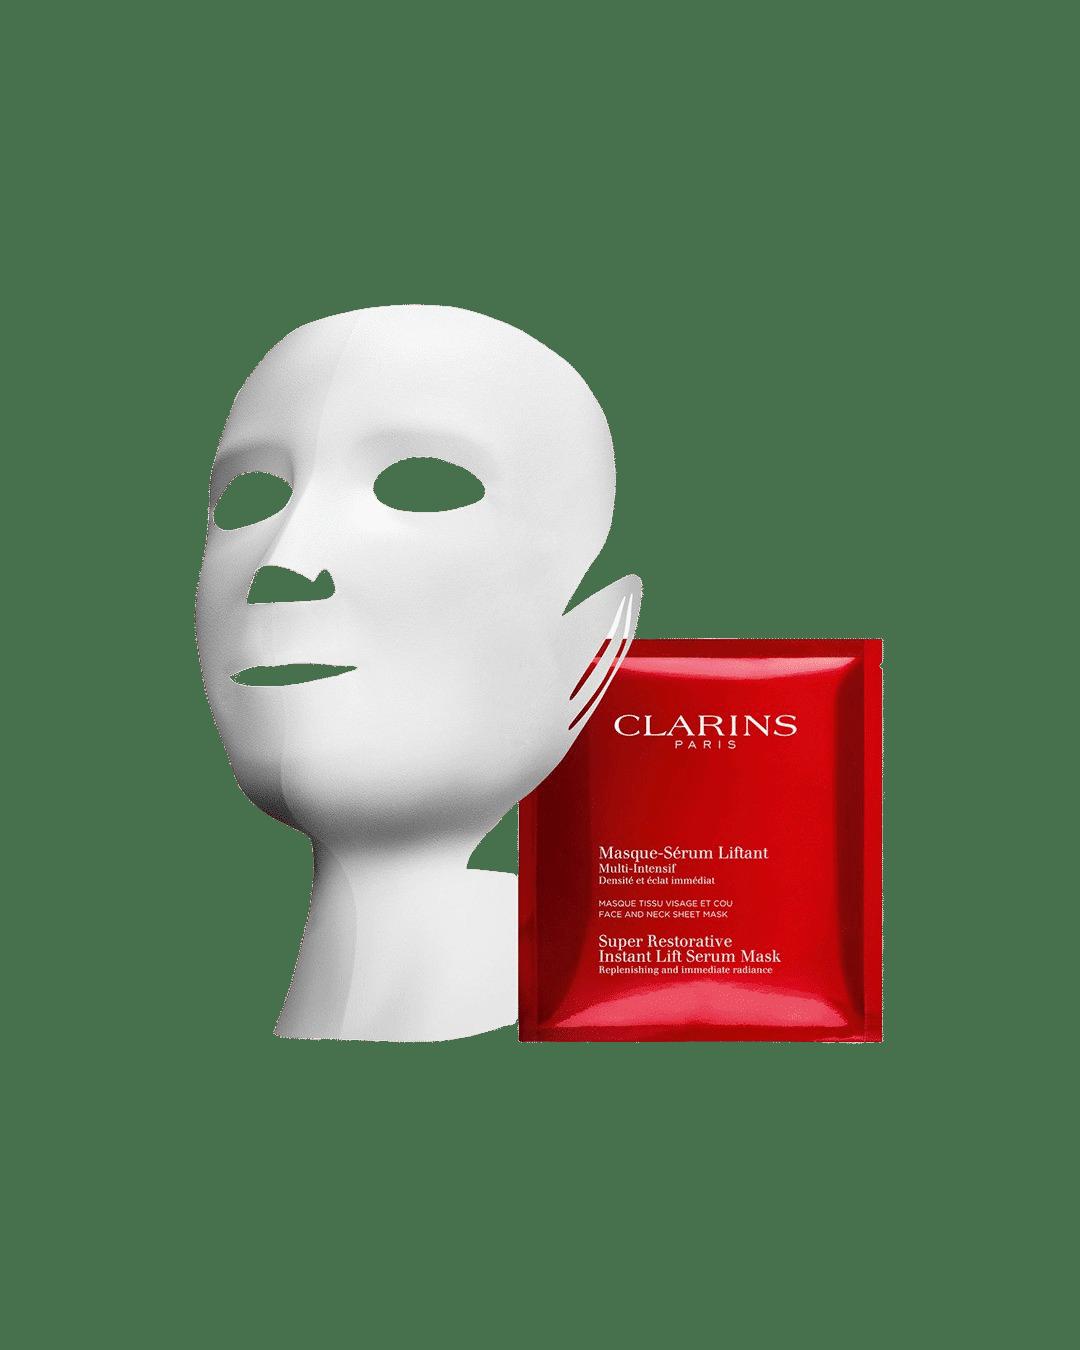 Super Restorative Instant Lift Serum-Mask 5 x 20ml